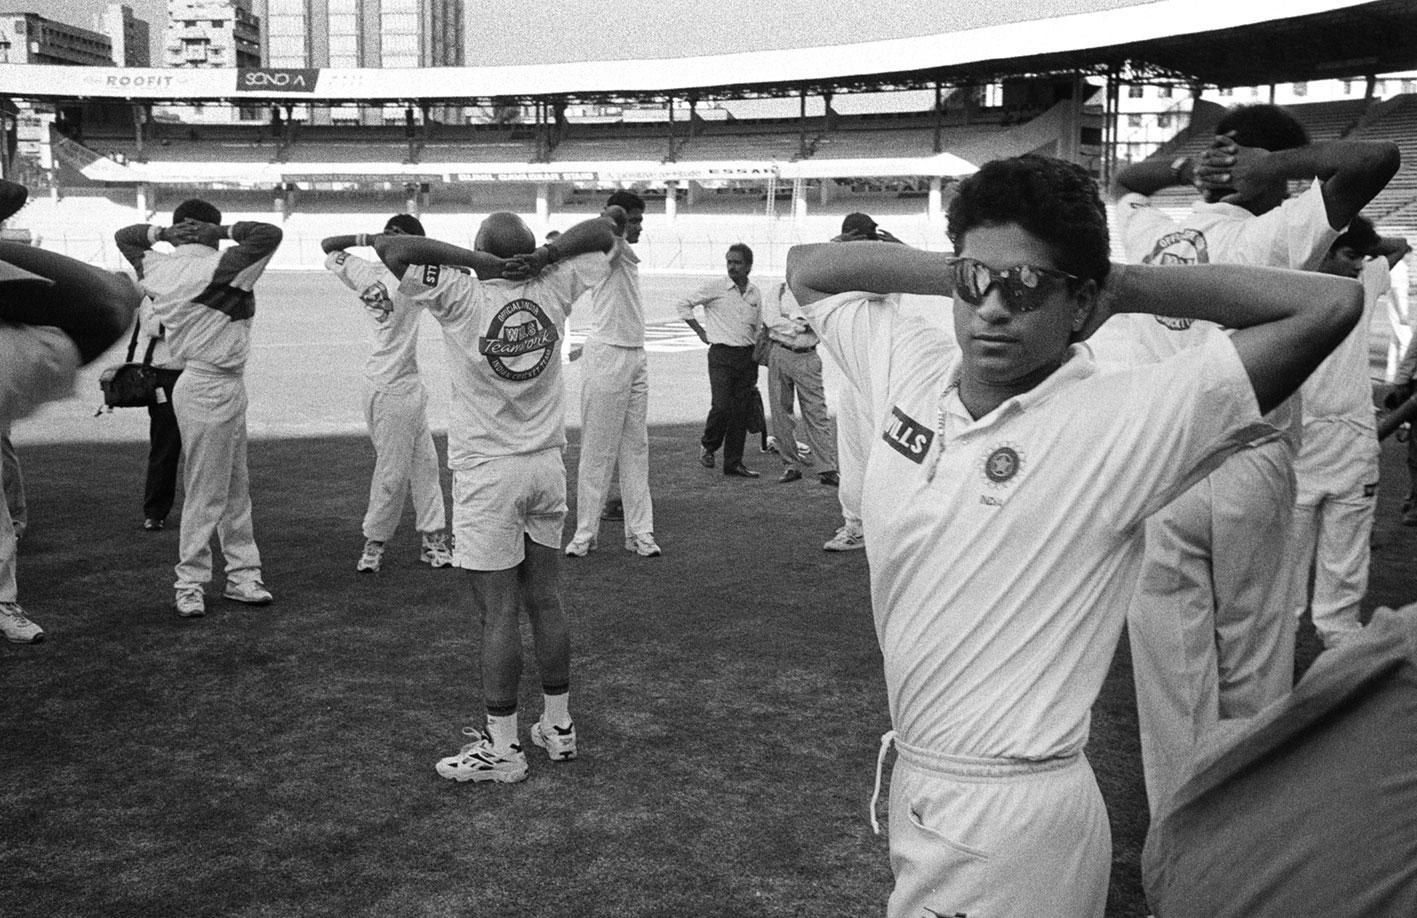 Sachin Tendulkar warming up at Wankhede Stadium // Trent Parke / Magnum Photos